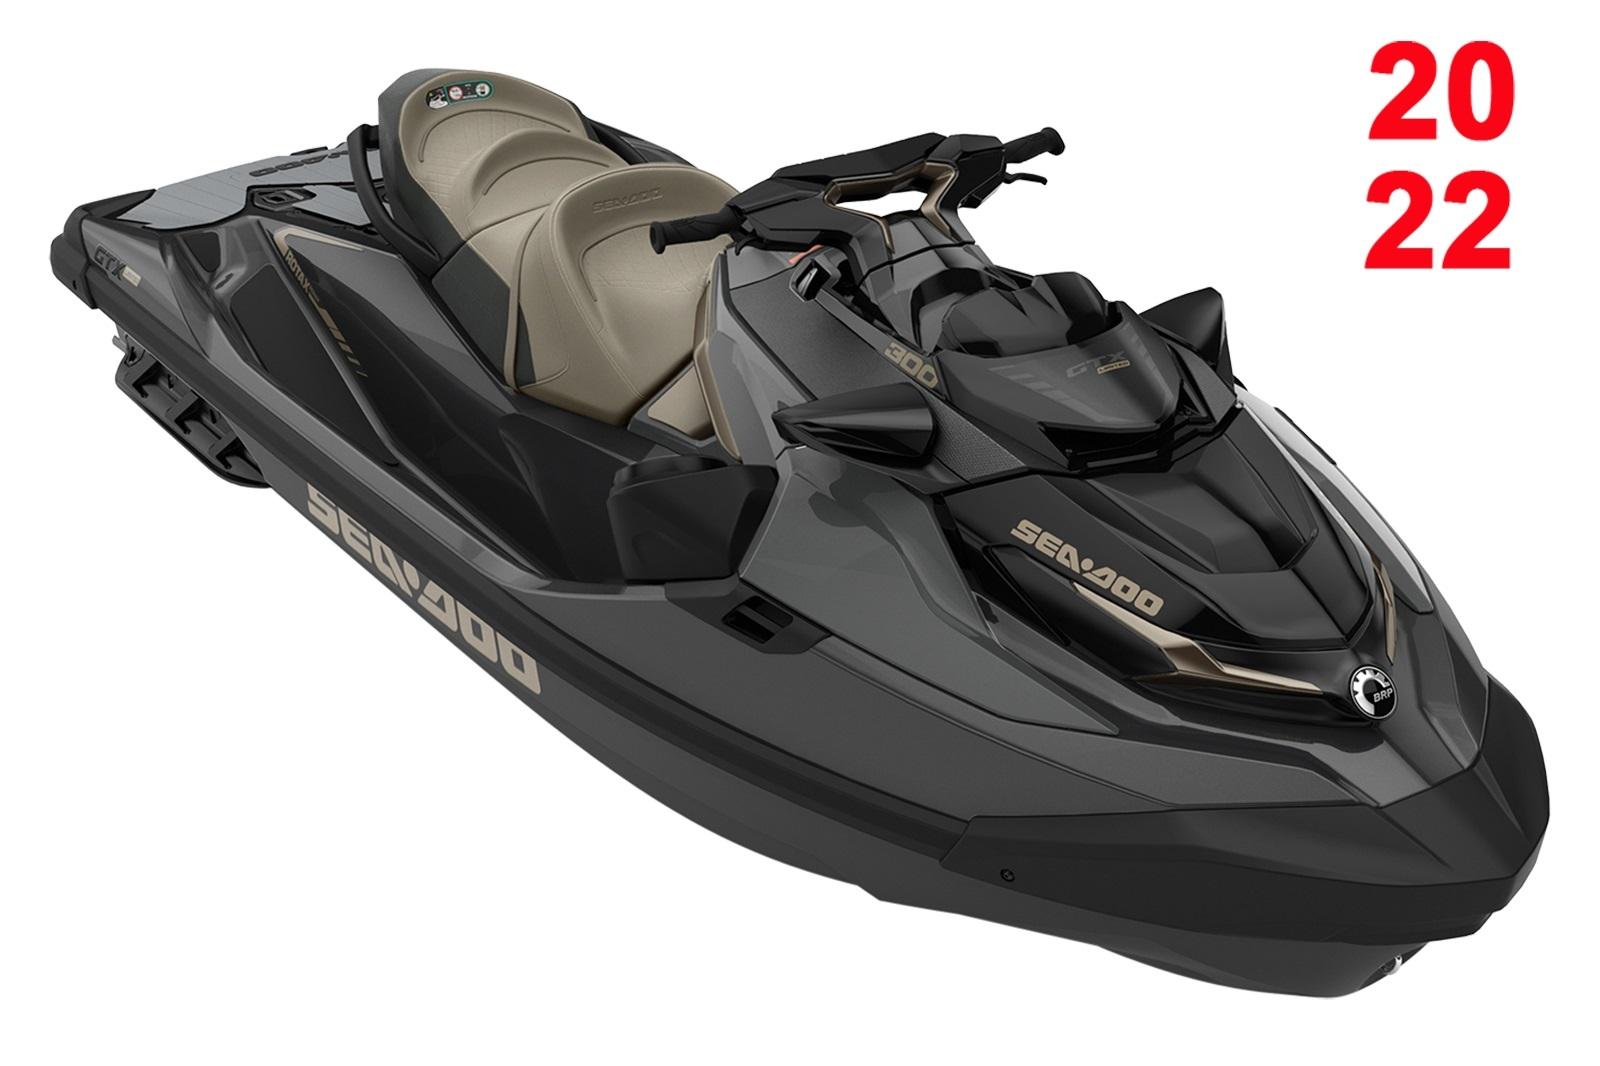 Sea Doo GTX LTD 3-up 300hp černý